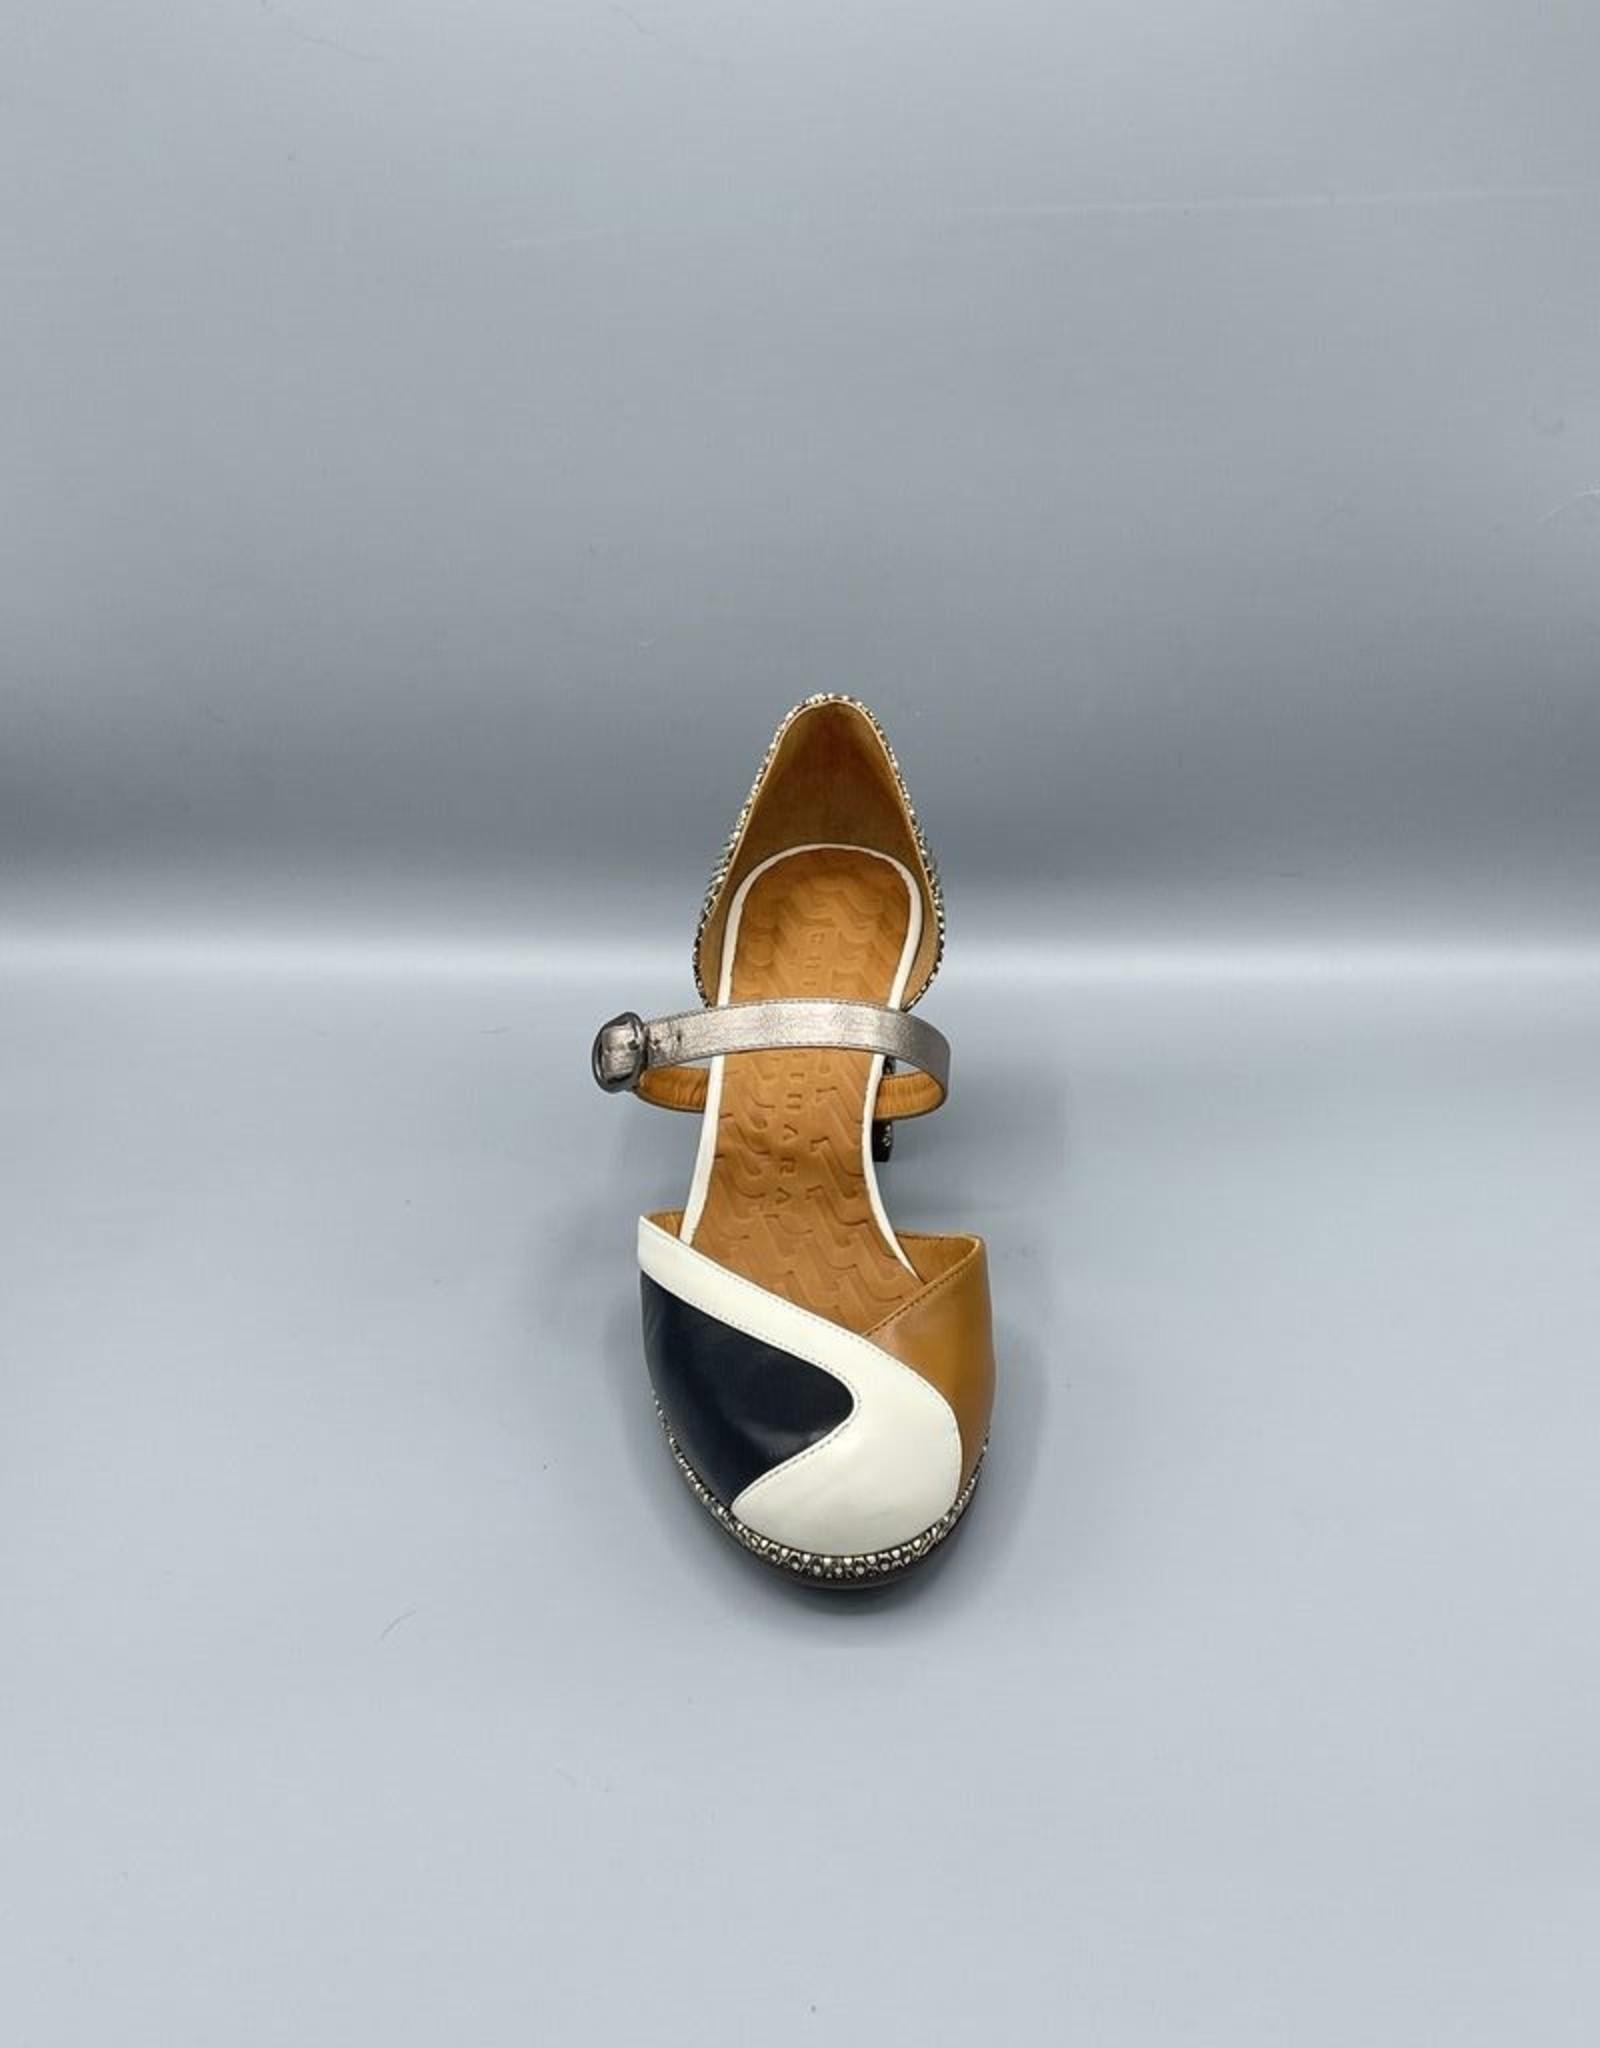 Chie Mihara Jadet Closed Toe Arch Buckle Block Heel   56mm